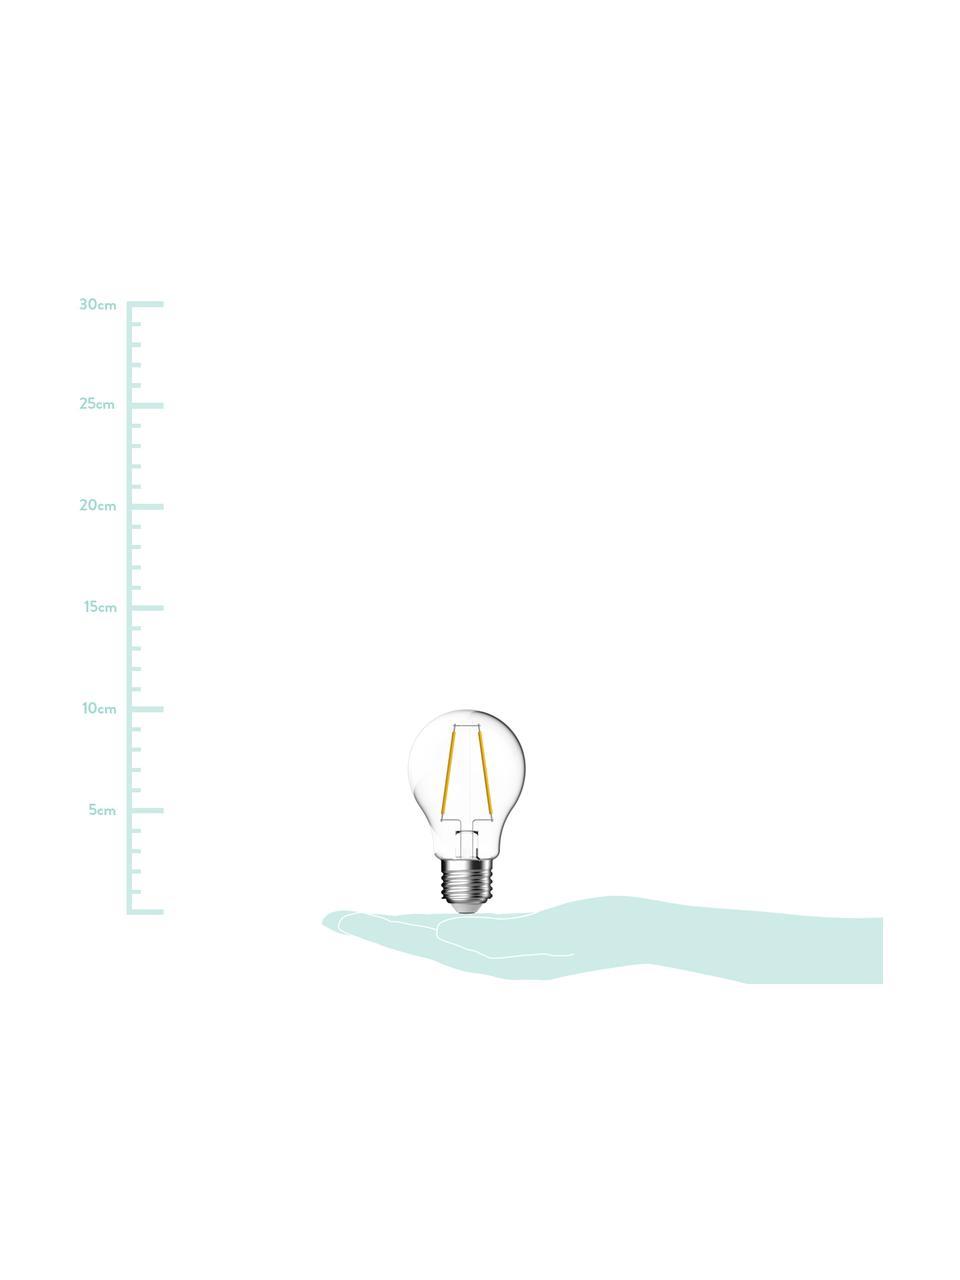 Lampadina E27, 4,6W, bianco caldo, 1 pz, Paralume: vetro, Base lampadina: alluminio, Trasparente, Ø 6 x Alt. 10 cm